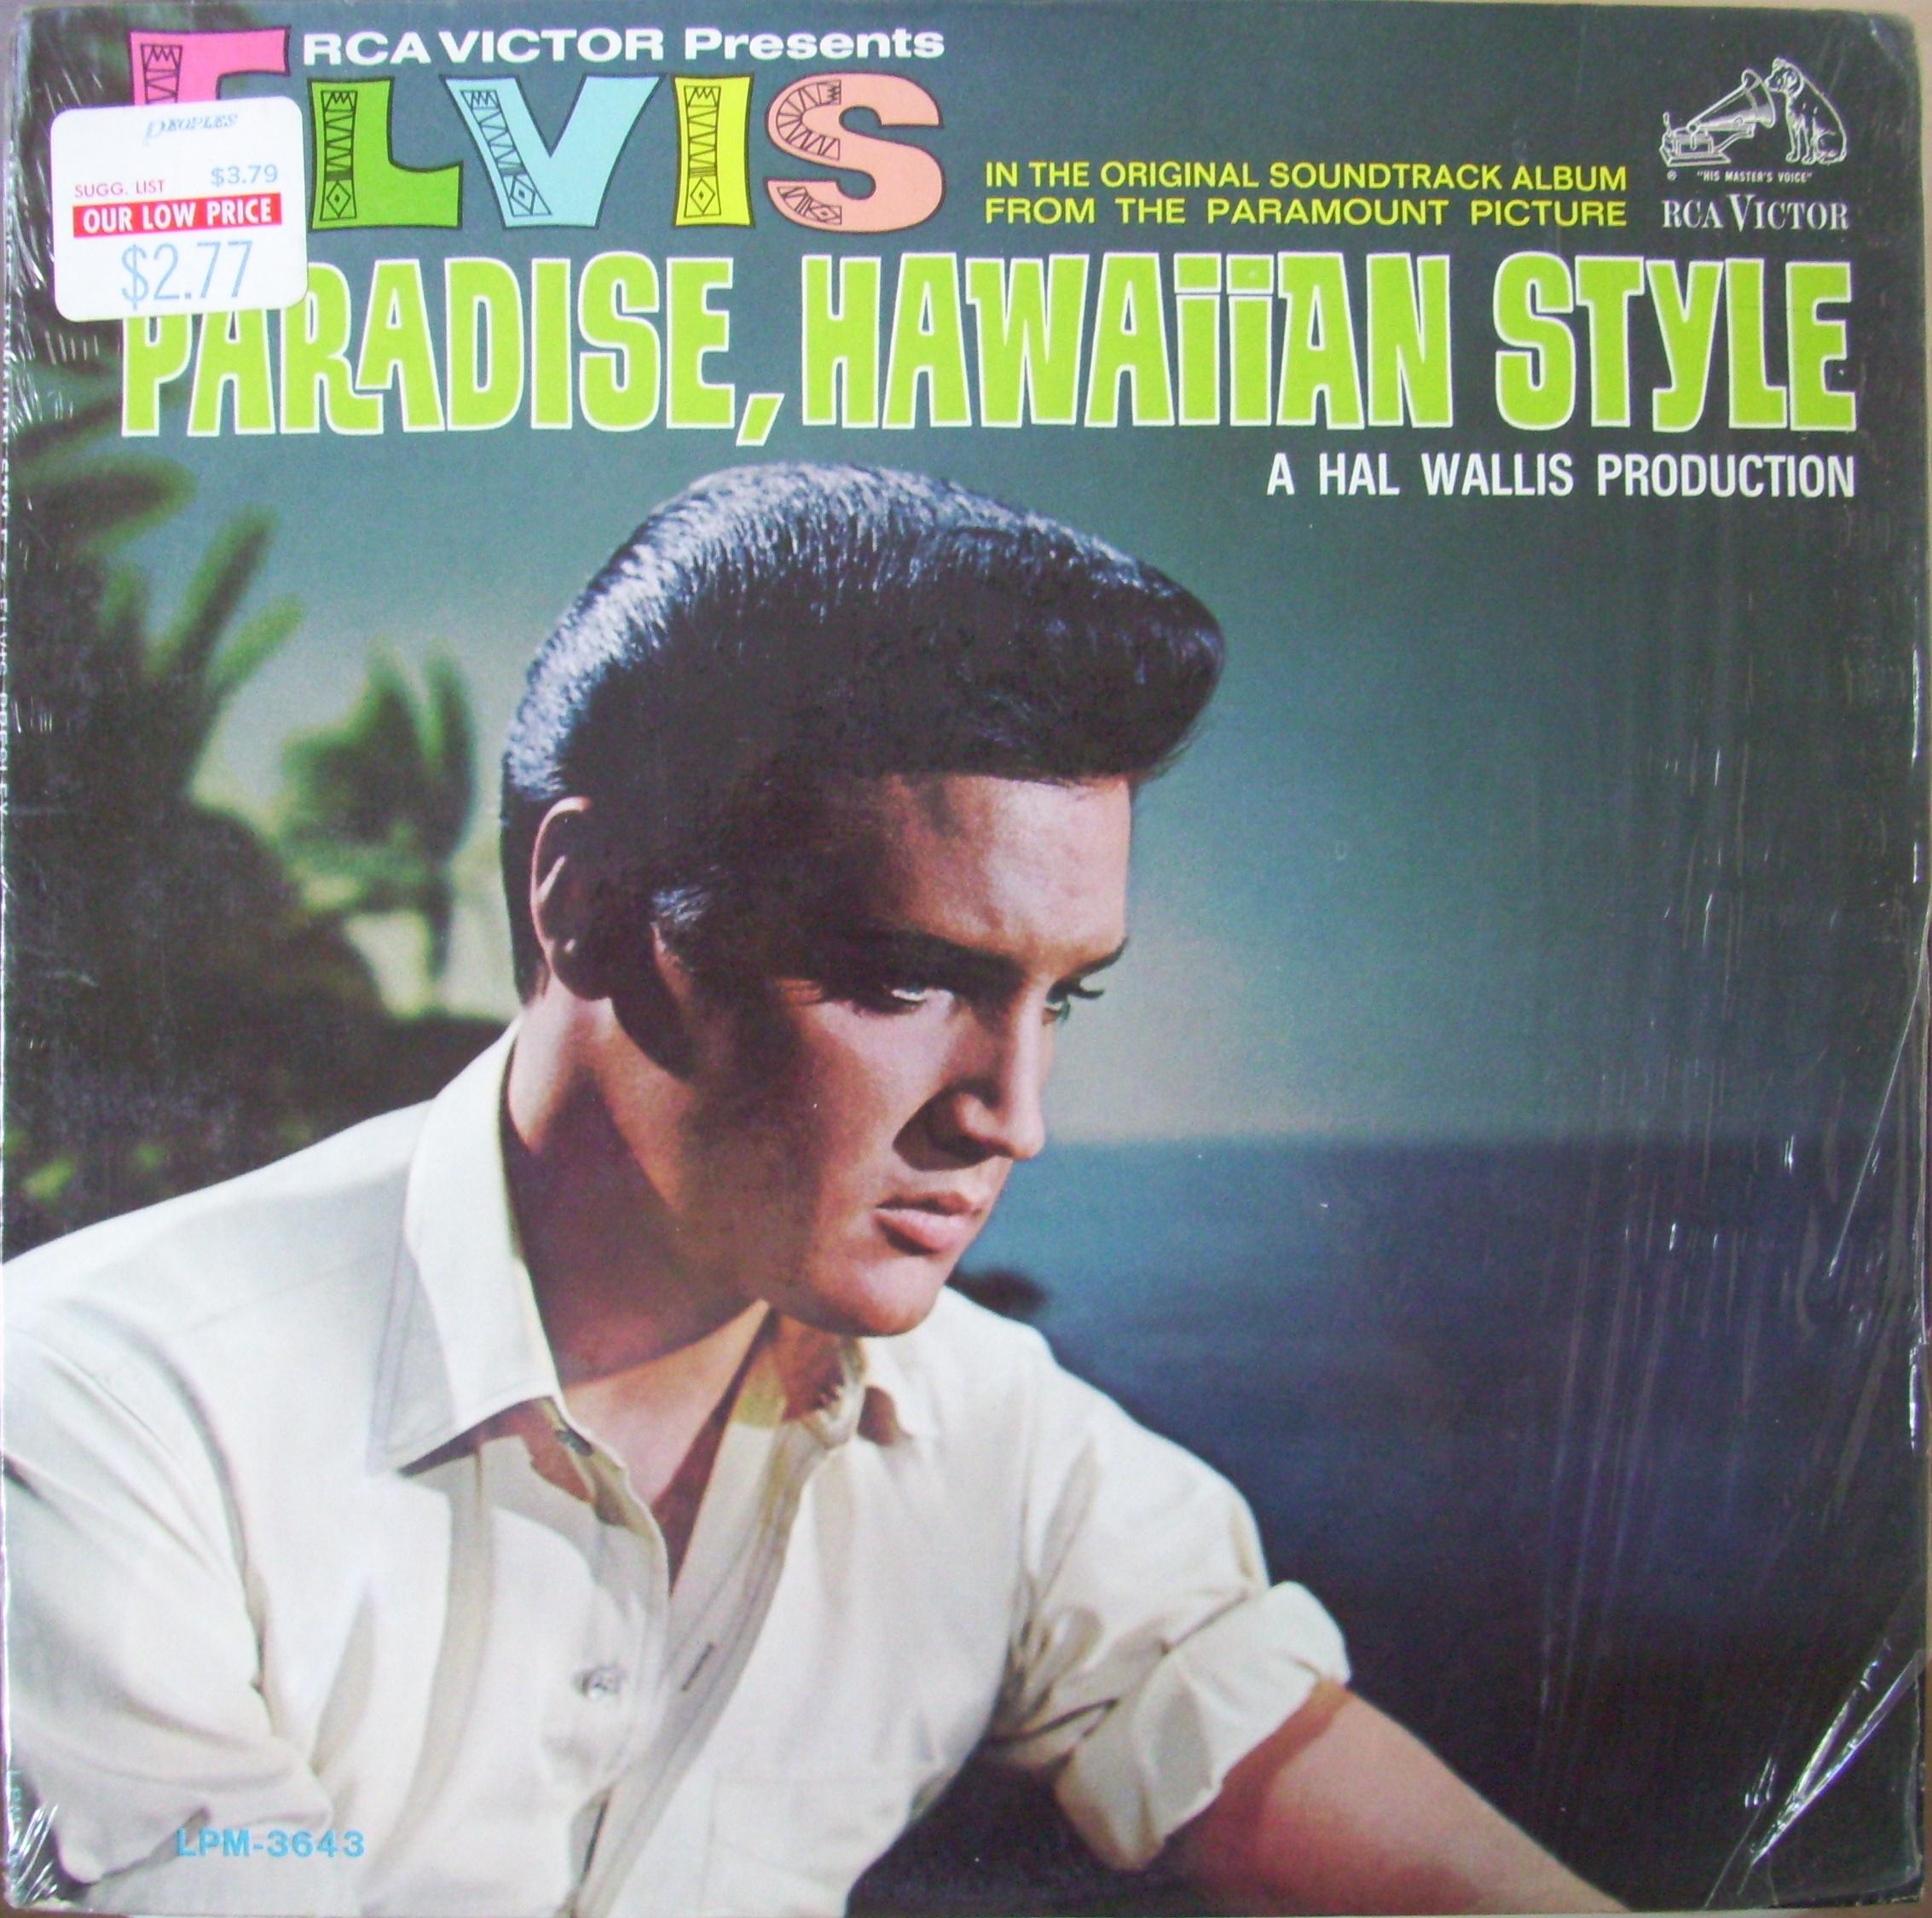 PARADISE, HAWAIIAN STYLE Z6zlr98u